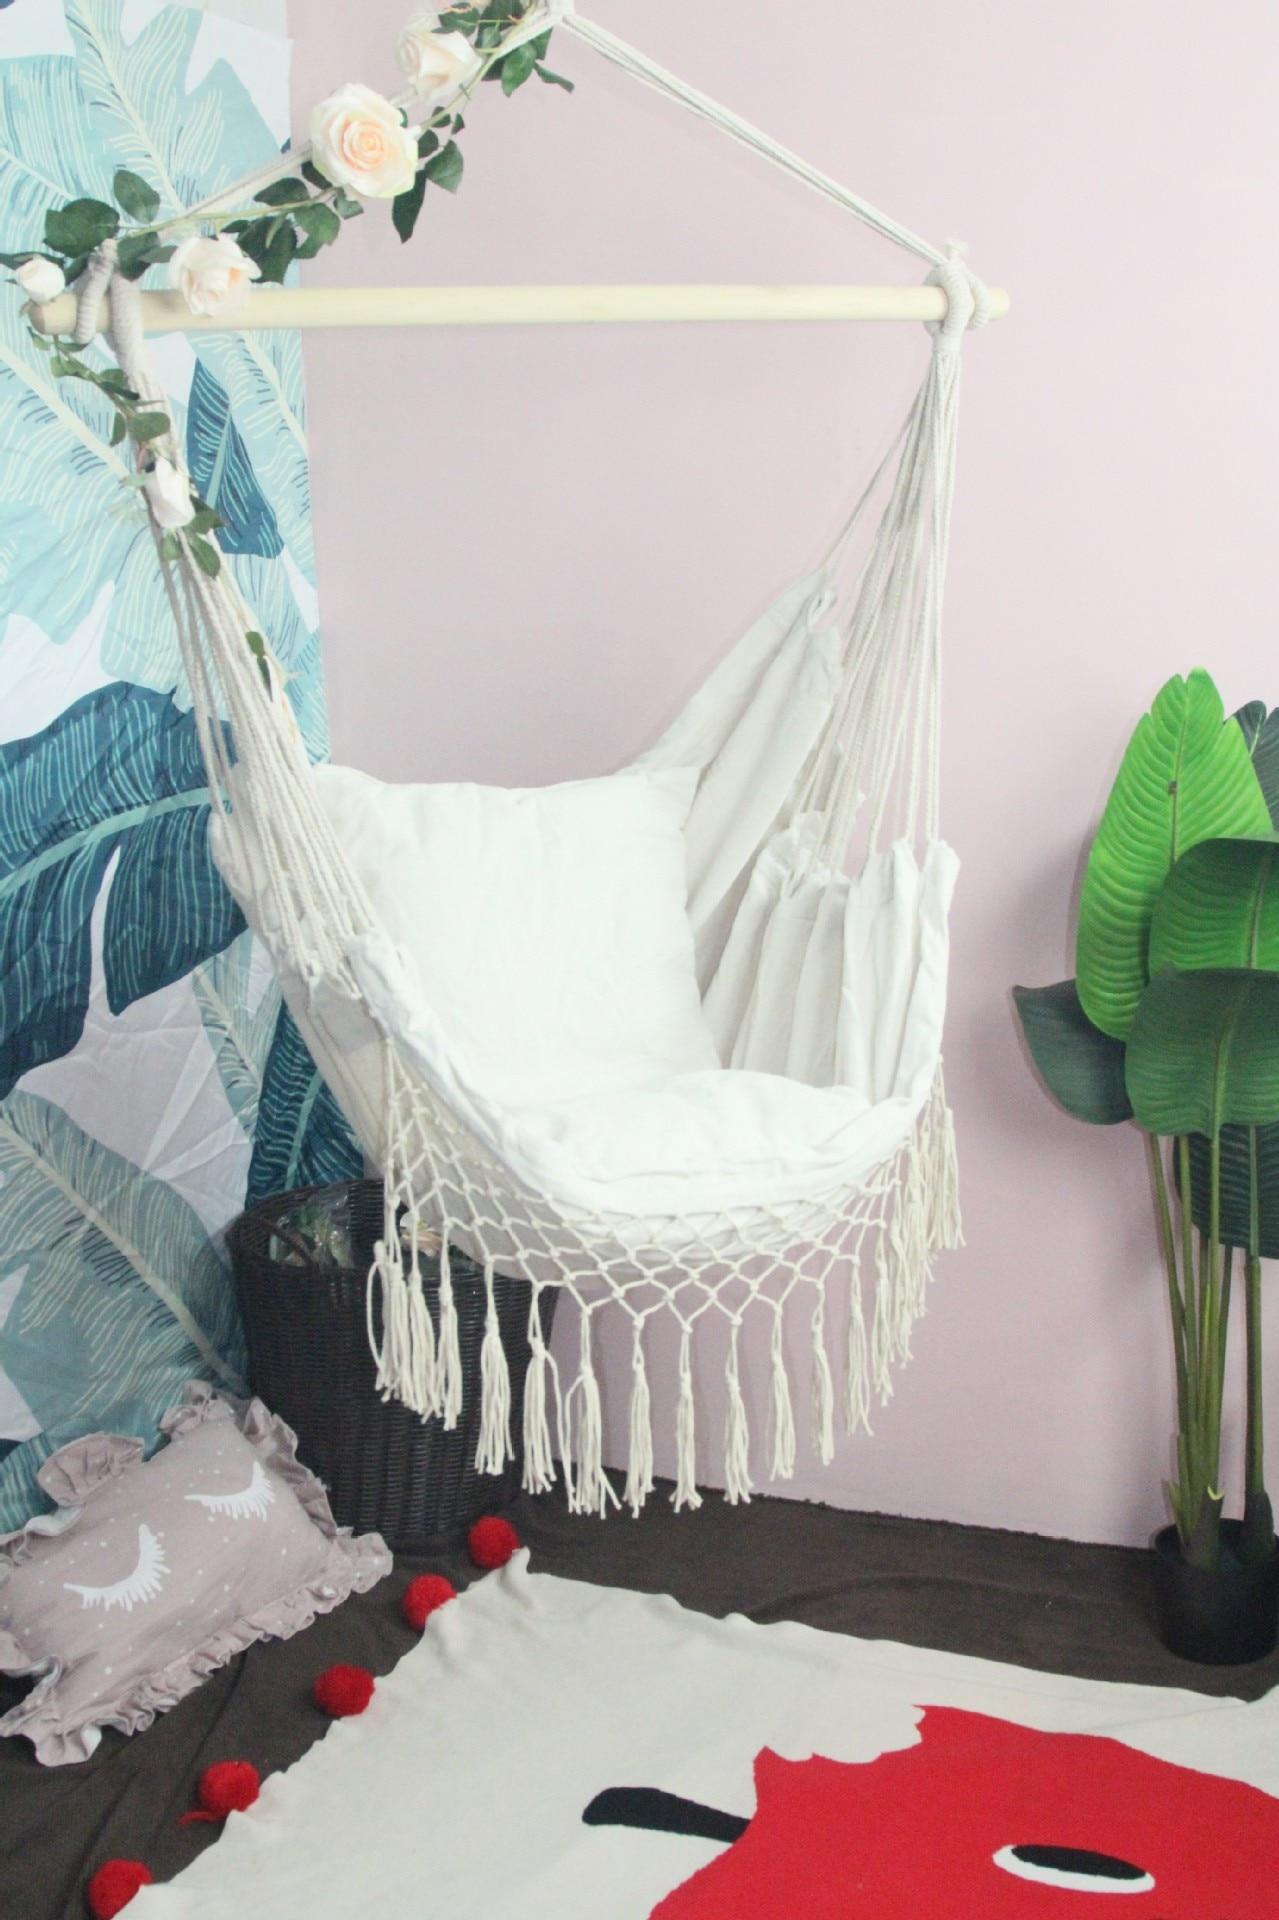 Variable gland chaise suspendue chaise hamac balançoire chambre meubles camping hamac chaise suspendue balançoire